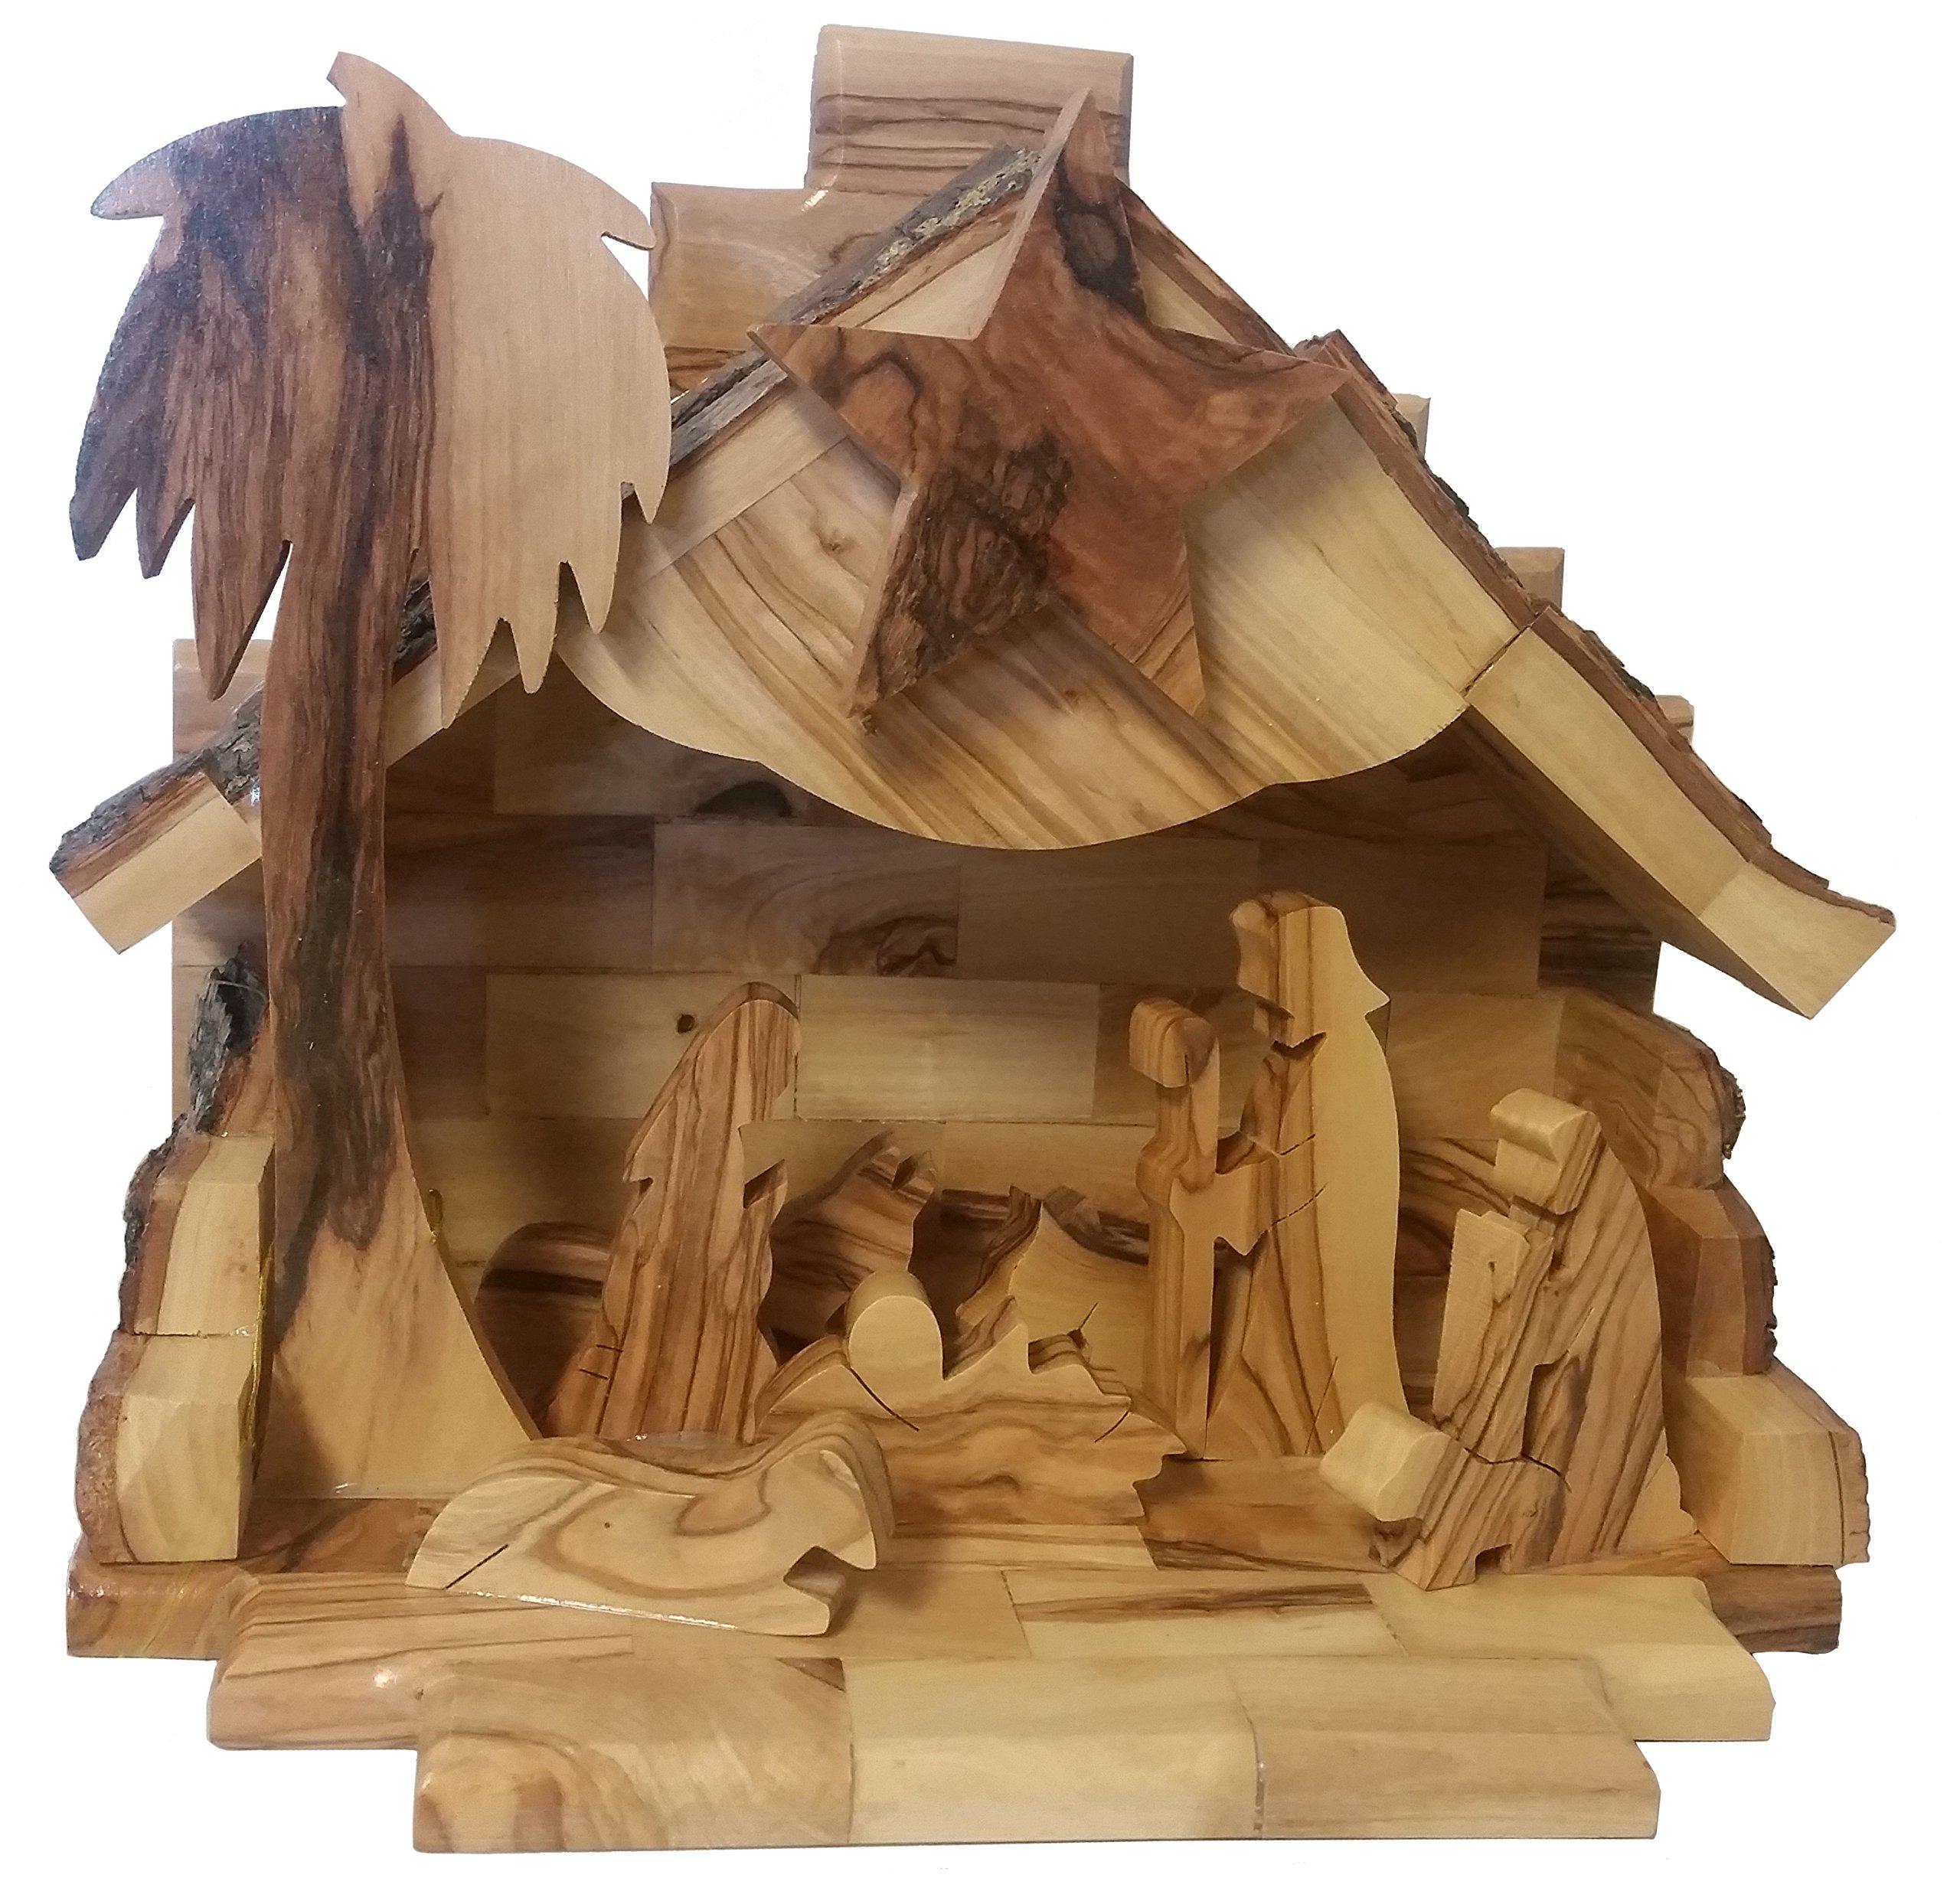 Earthwood Olive Wood Music Box Nativity Scene